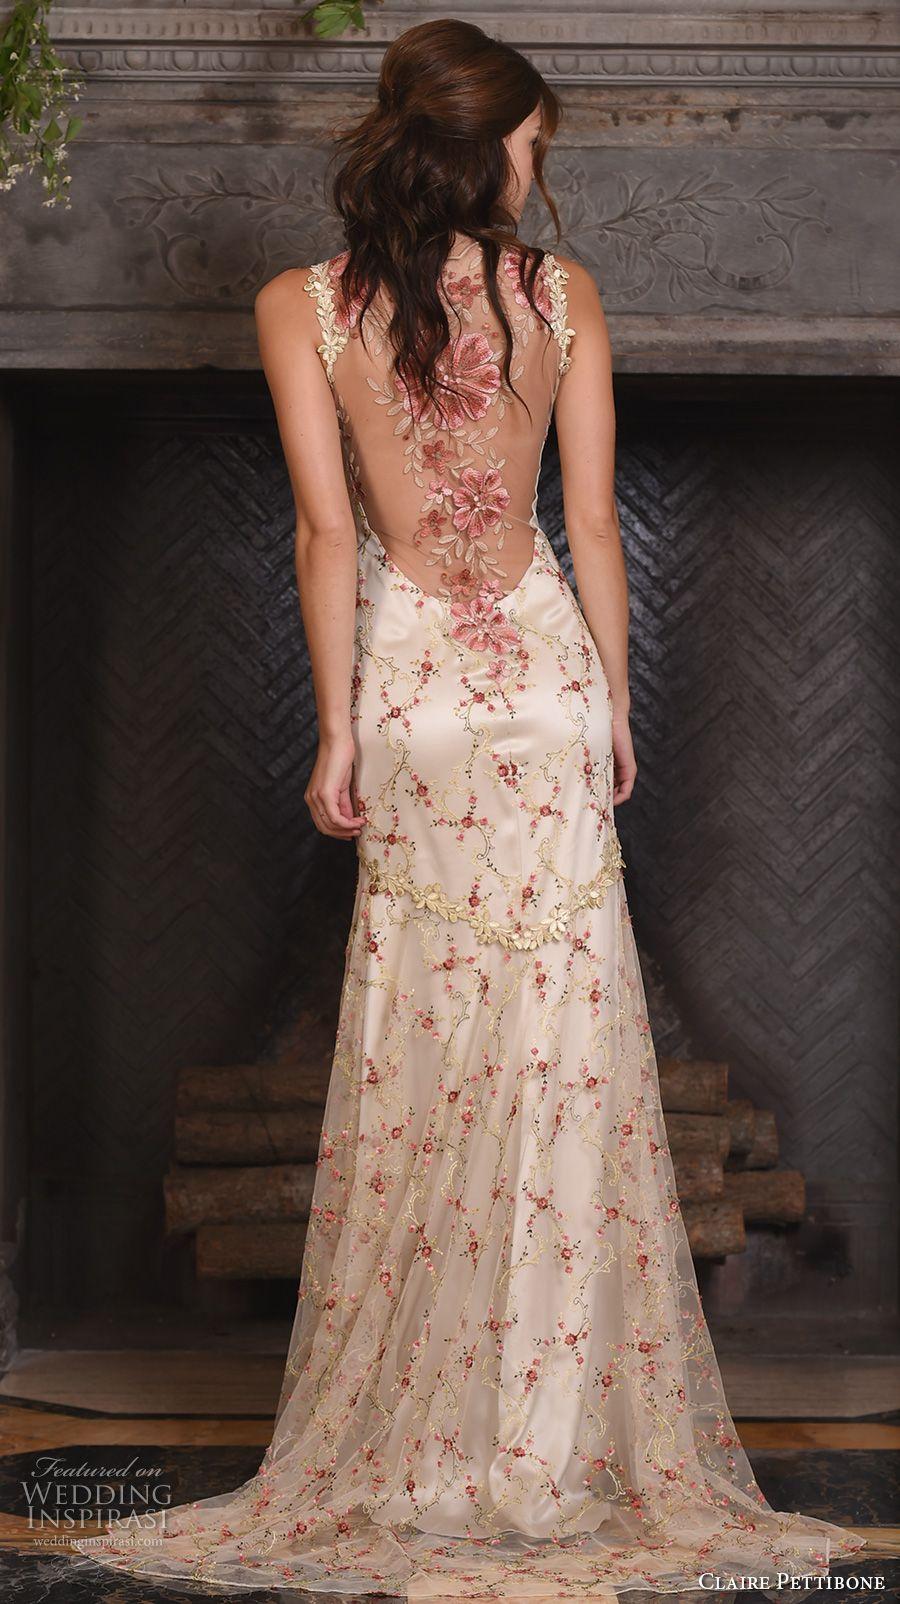 Claire pettibone fall wedding dresses u ucthe four seasons